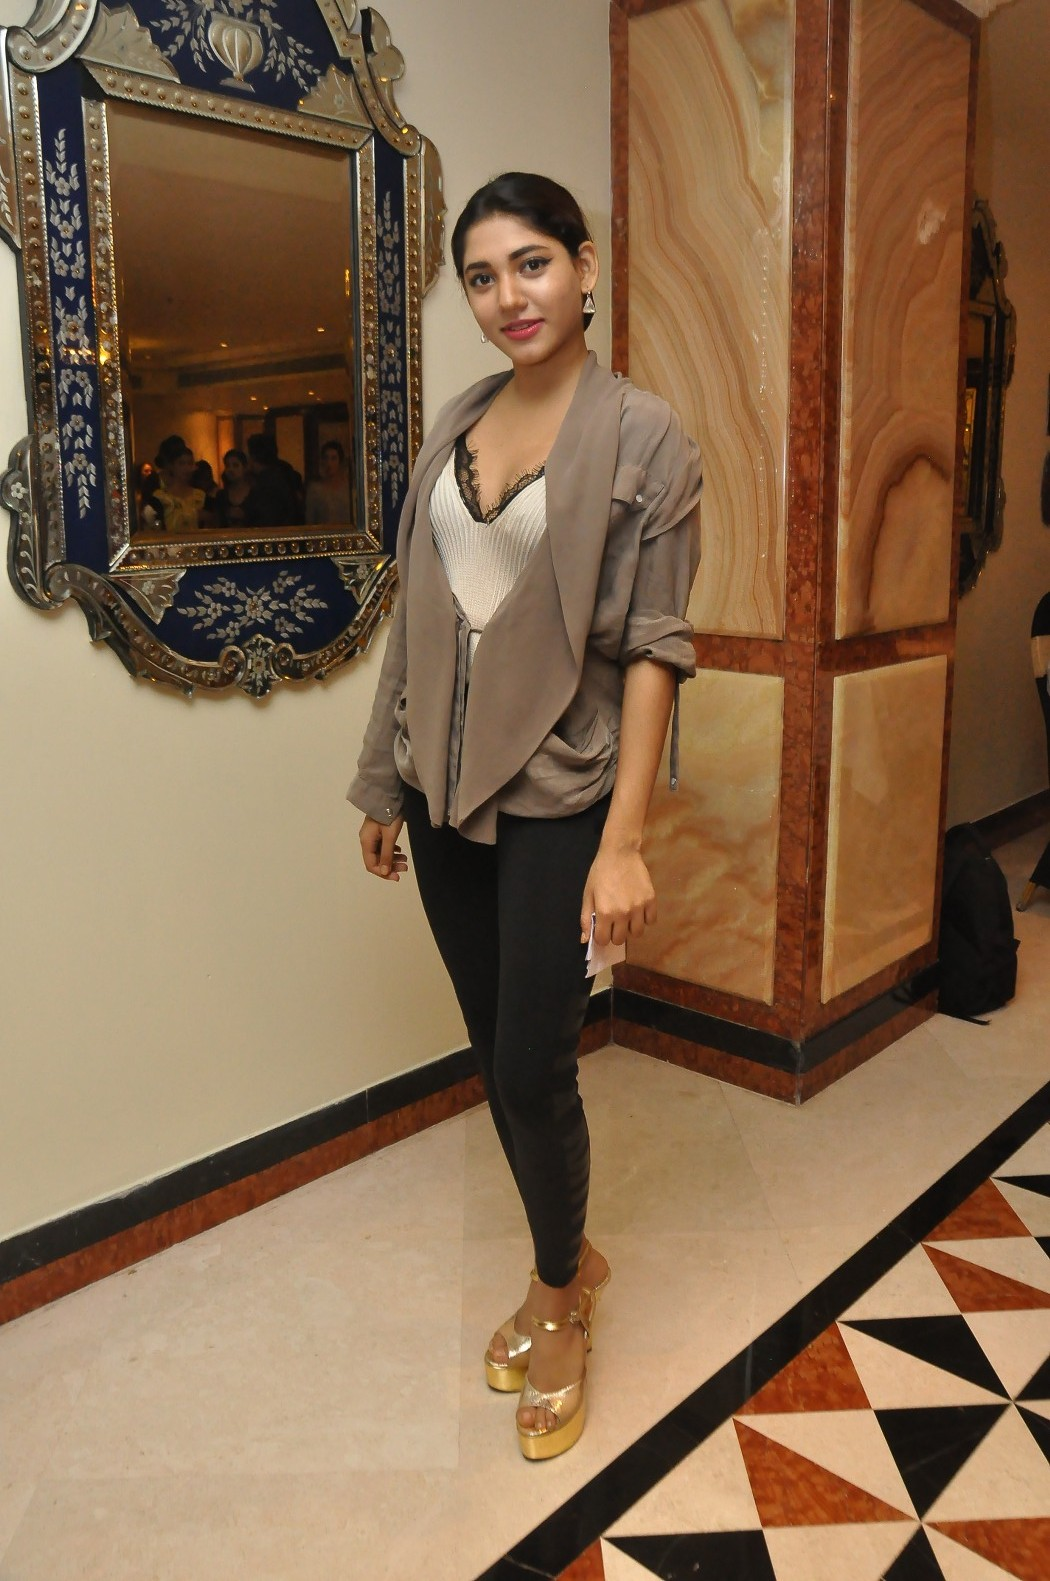 Love For Handloom Celebs and Models Dazzle In Elegant Outfit   Love For Handloom Praneetha Love For Handloom 10